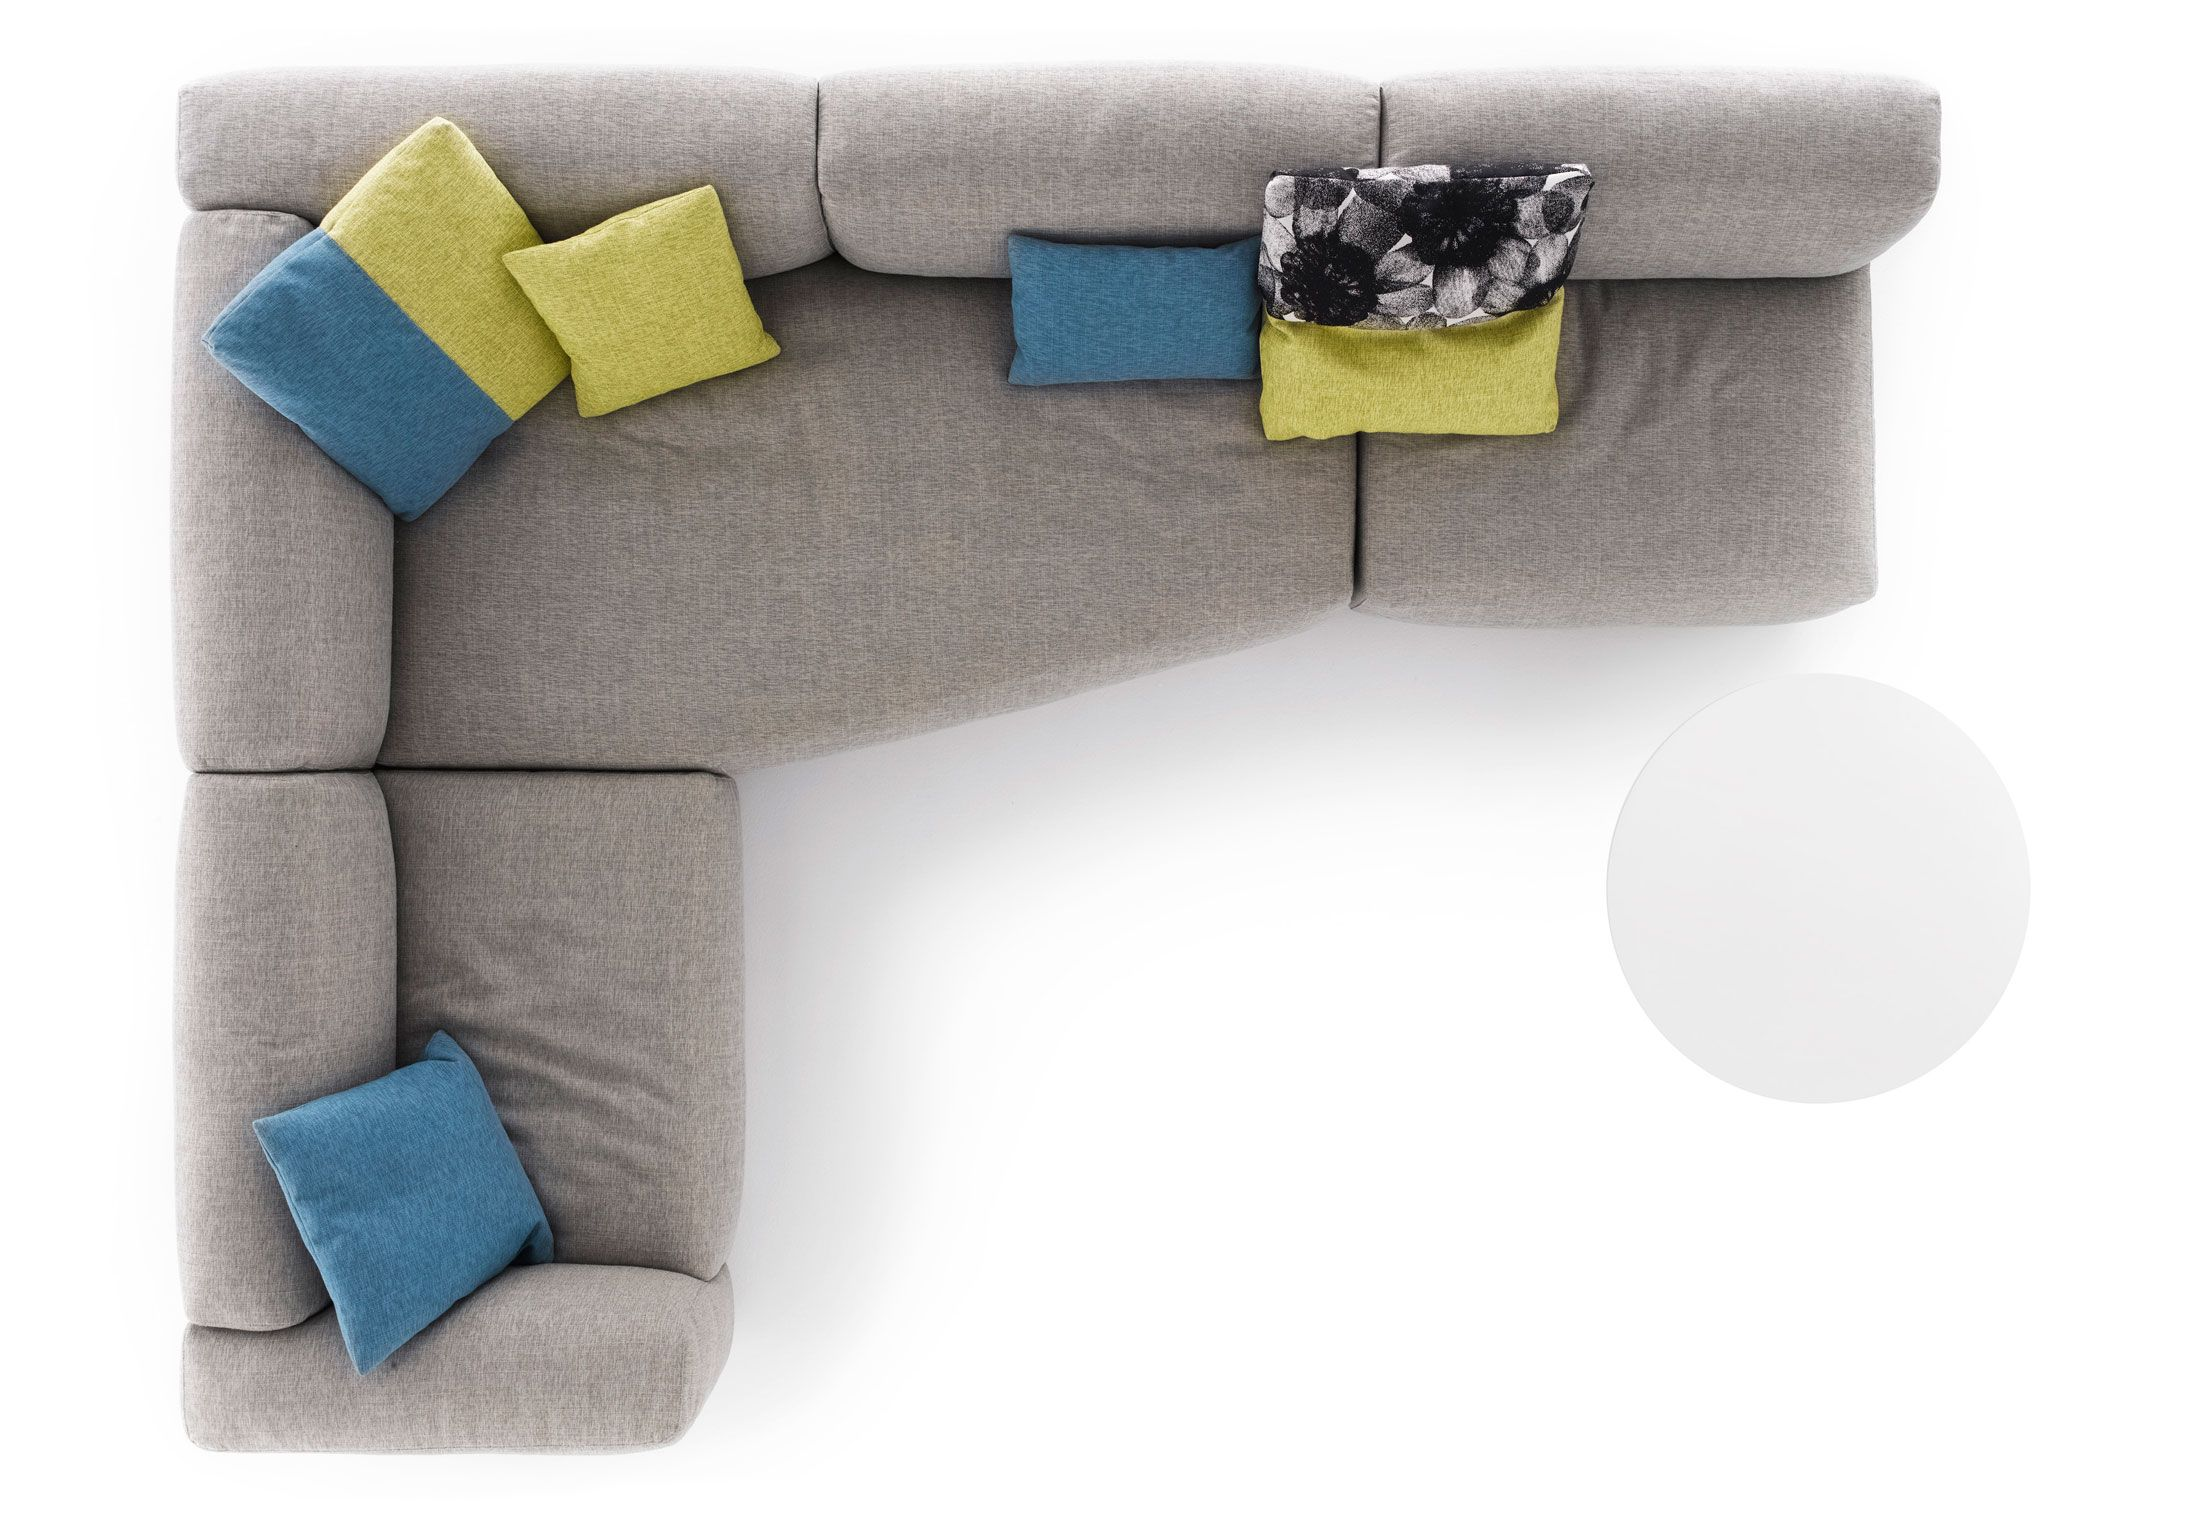 Chair Design Top View Stressless Sofa Italia Sofas At Psd Plan